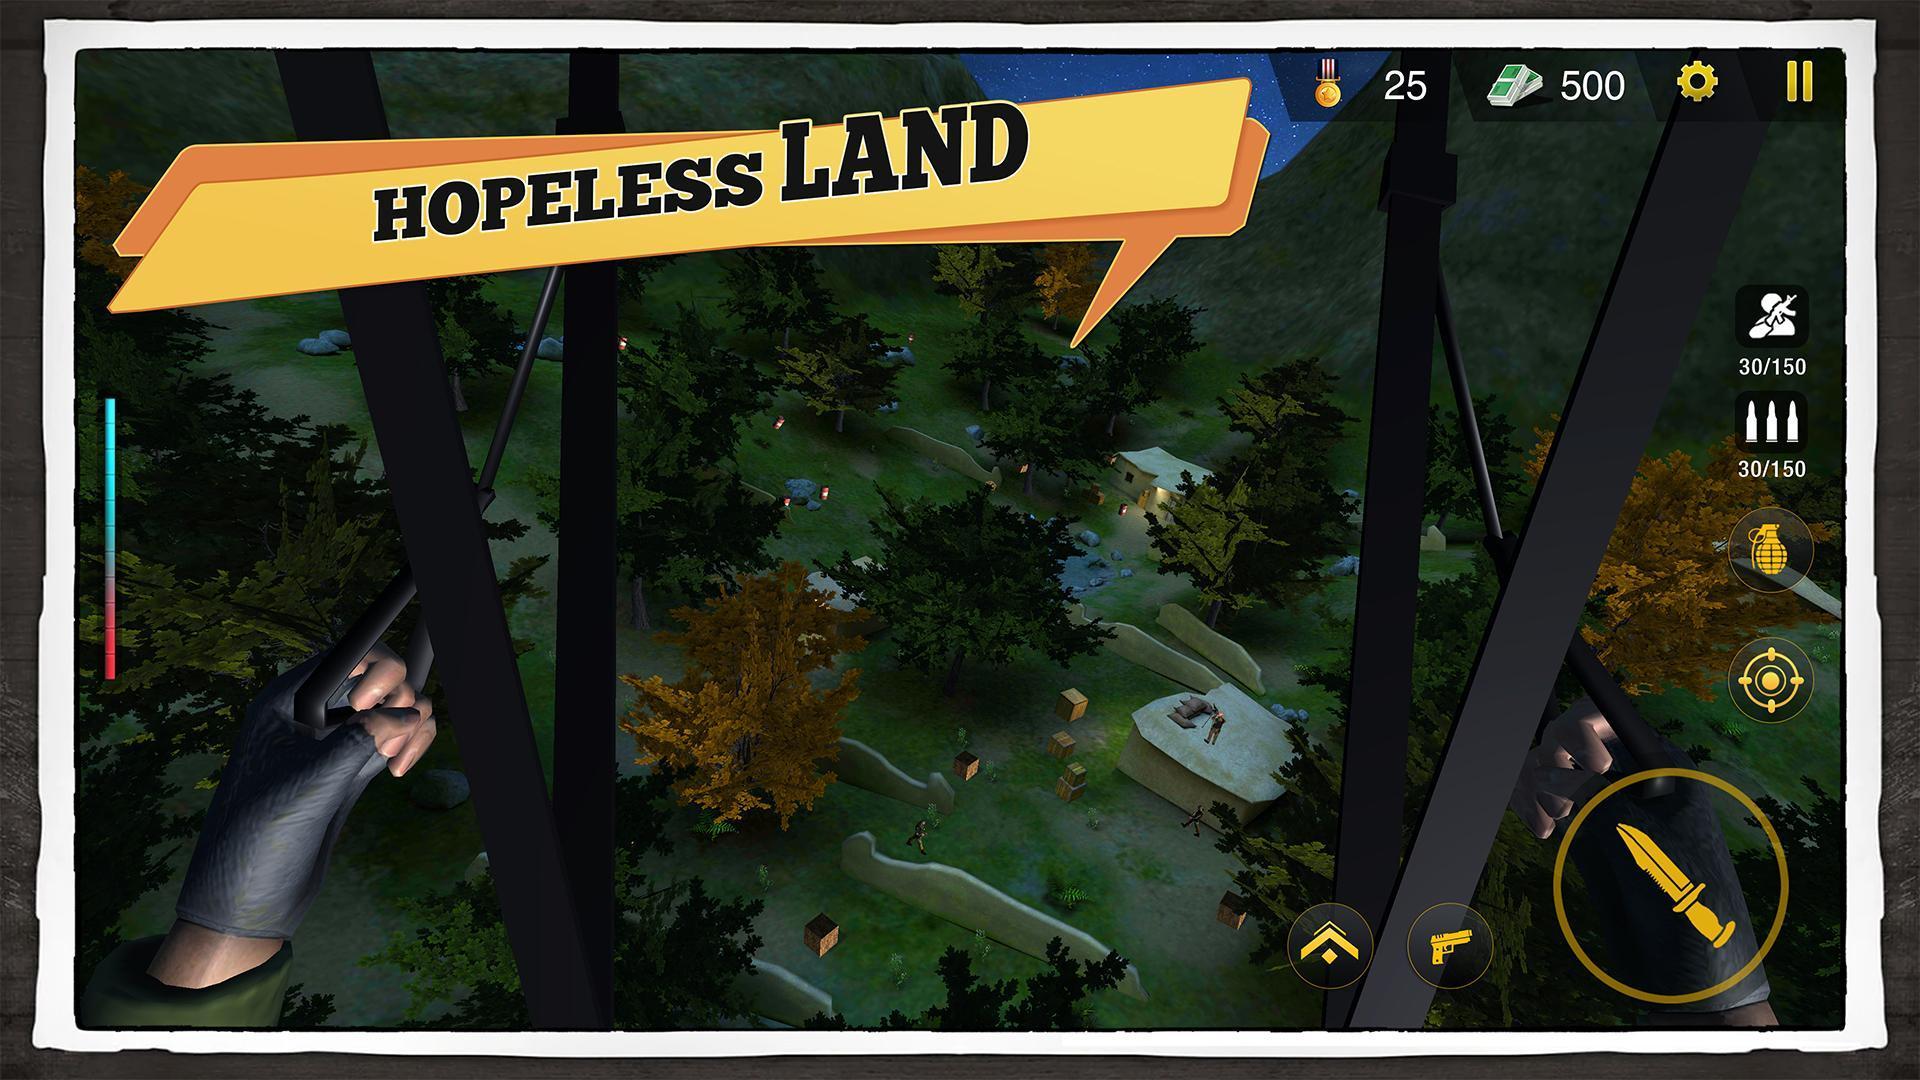 Yalghaar Delta IGI Commando Adventure Mobile Game 3.4 Screenshot 11